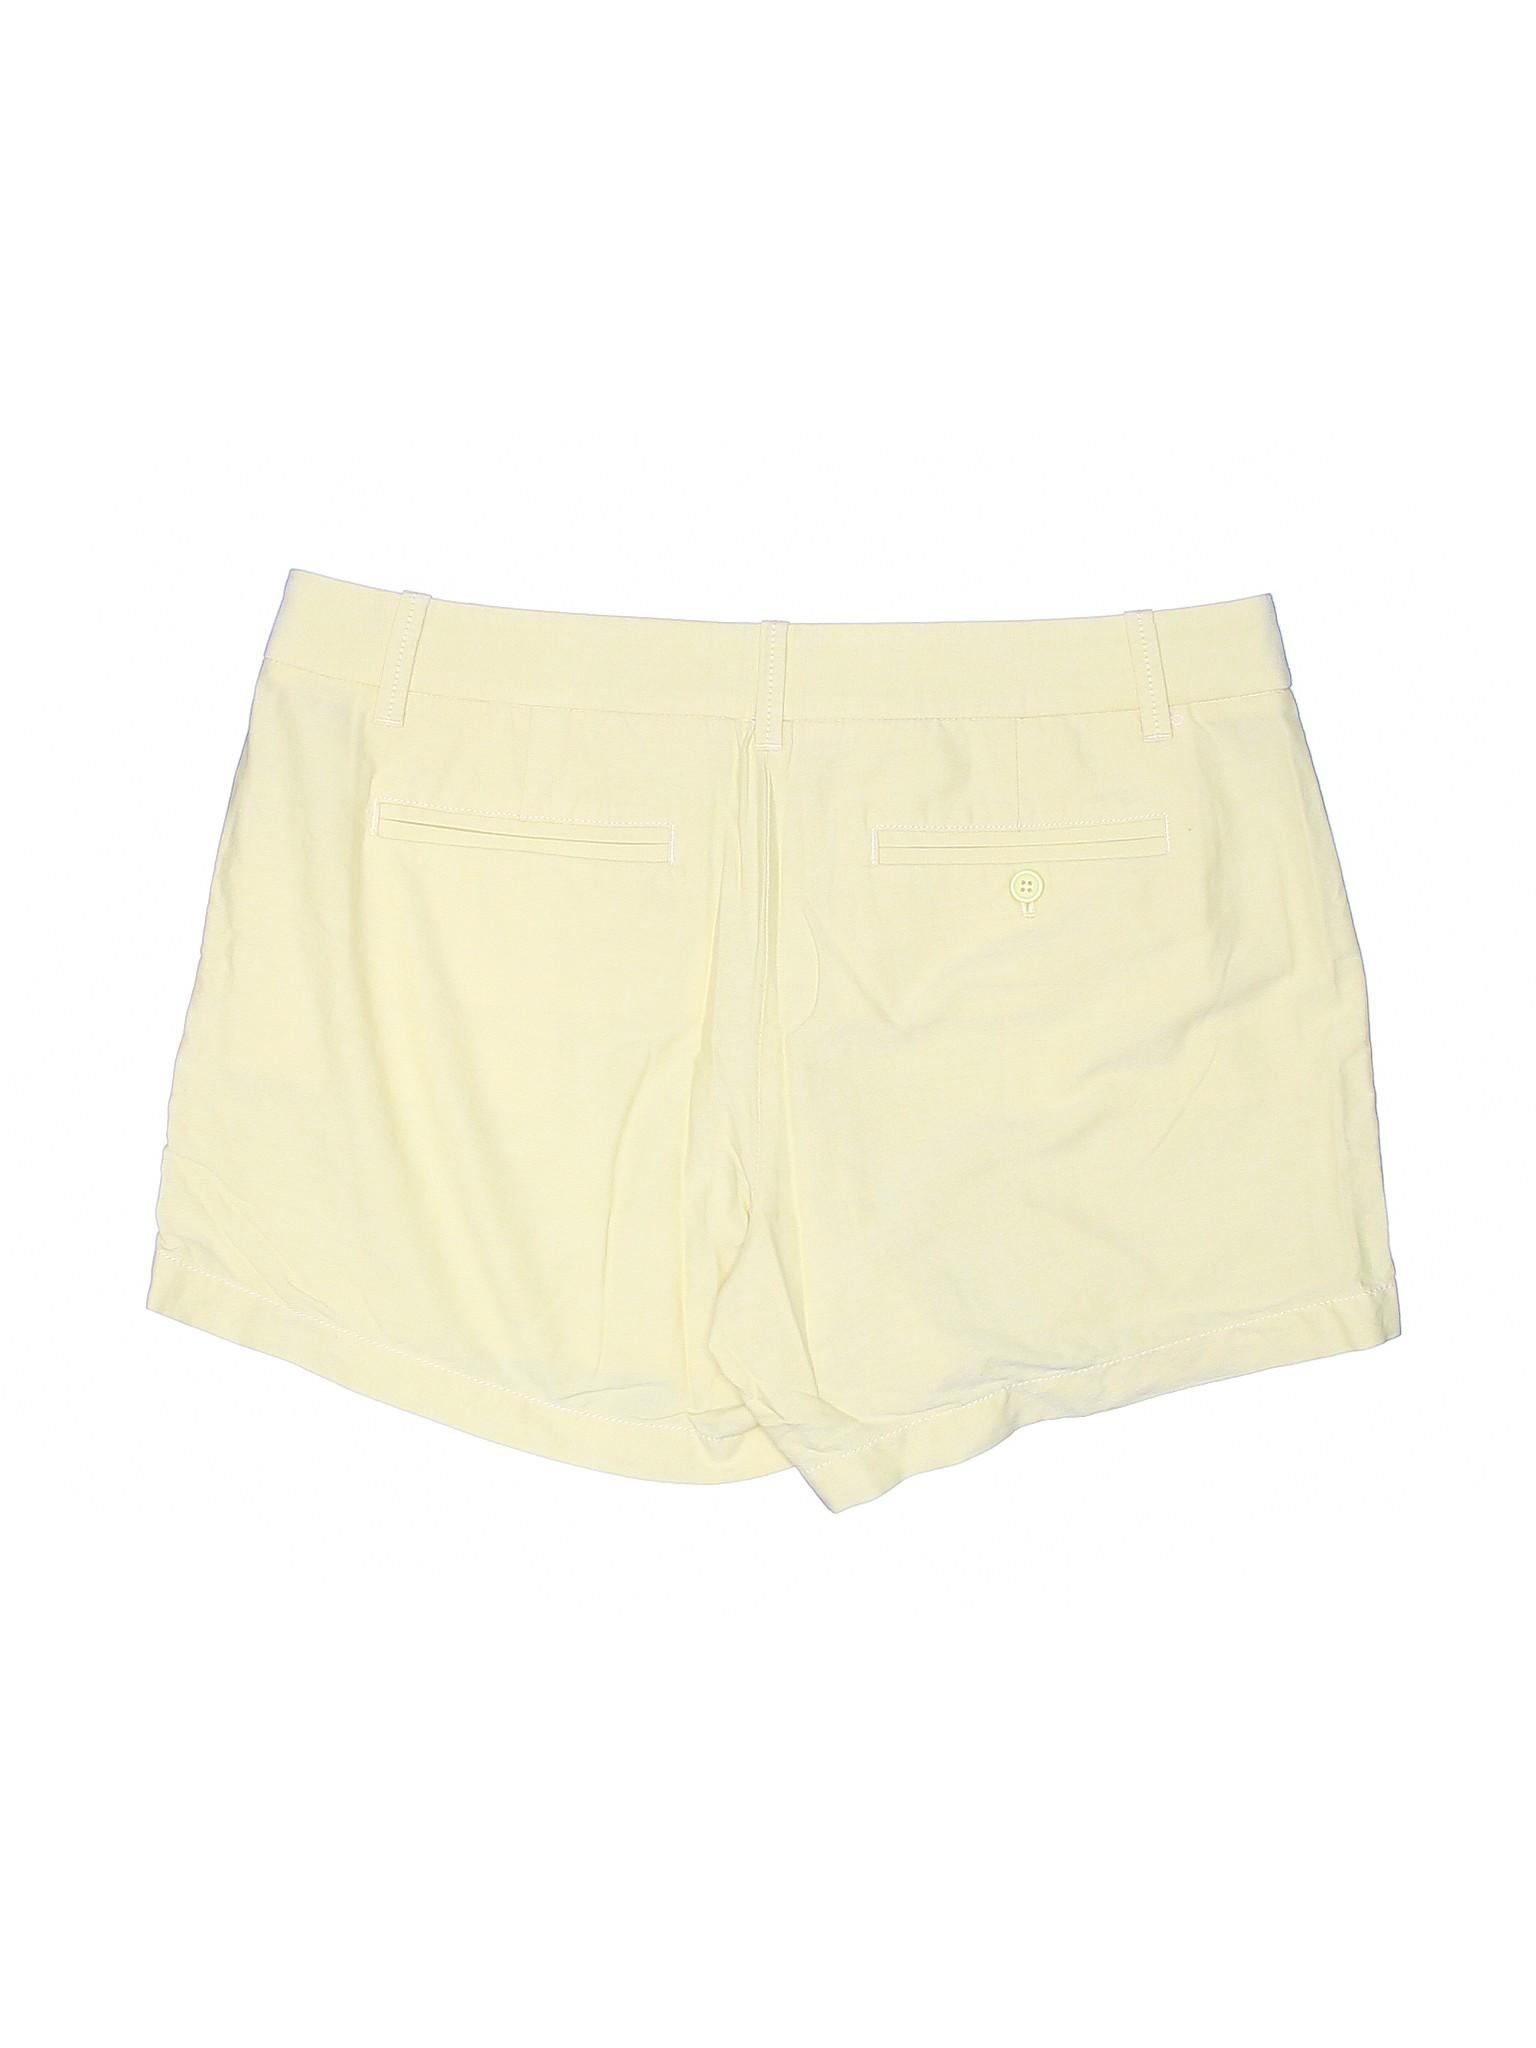 Store Shorts Boutique Factory J Khaki Crew 488XtxB